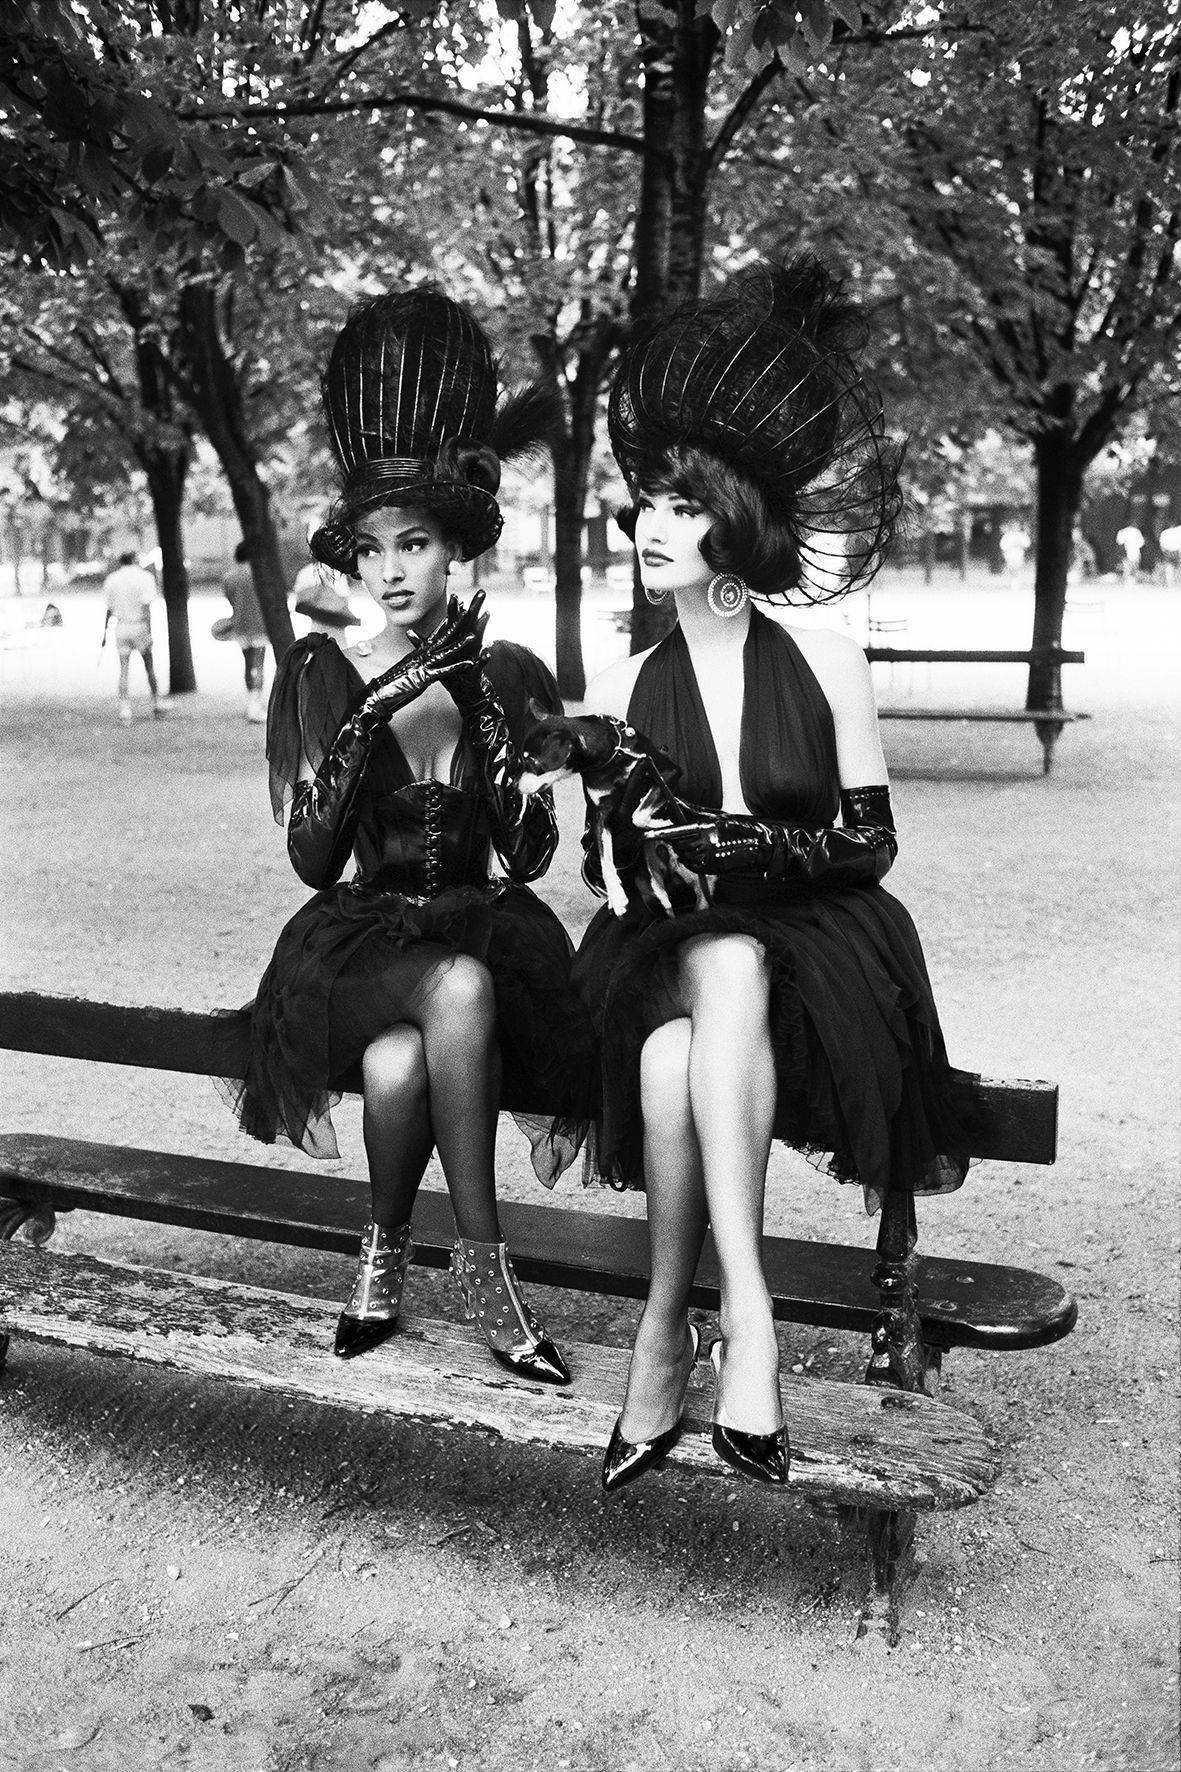 Haute Couture, Paris, 1991, 20 x 16 Silver Gelatin Photograph, Ed. 15